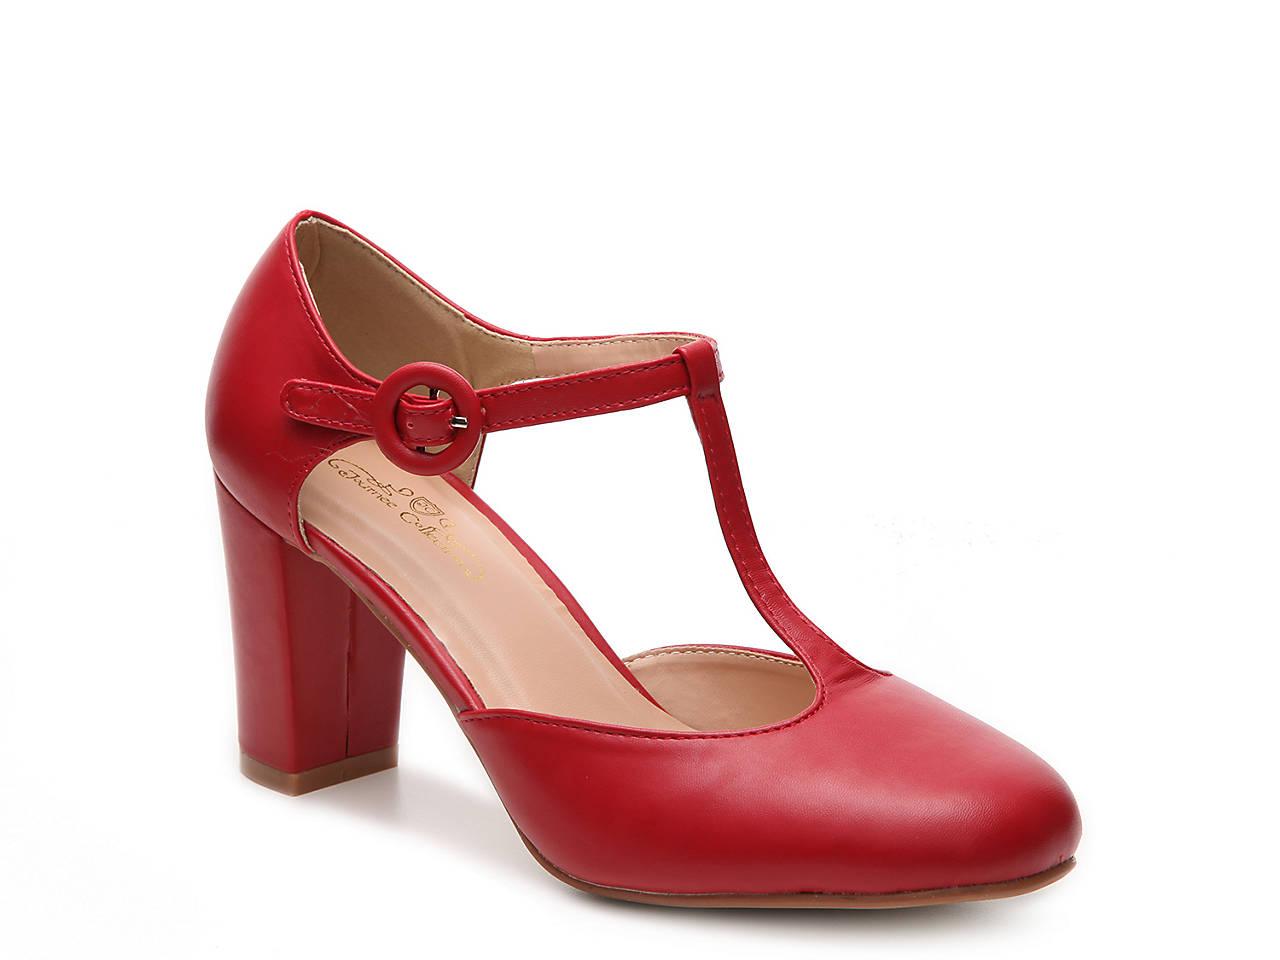 bb5d66eb60f Journee Collection Talie Pump Women s Shoes